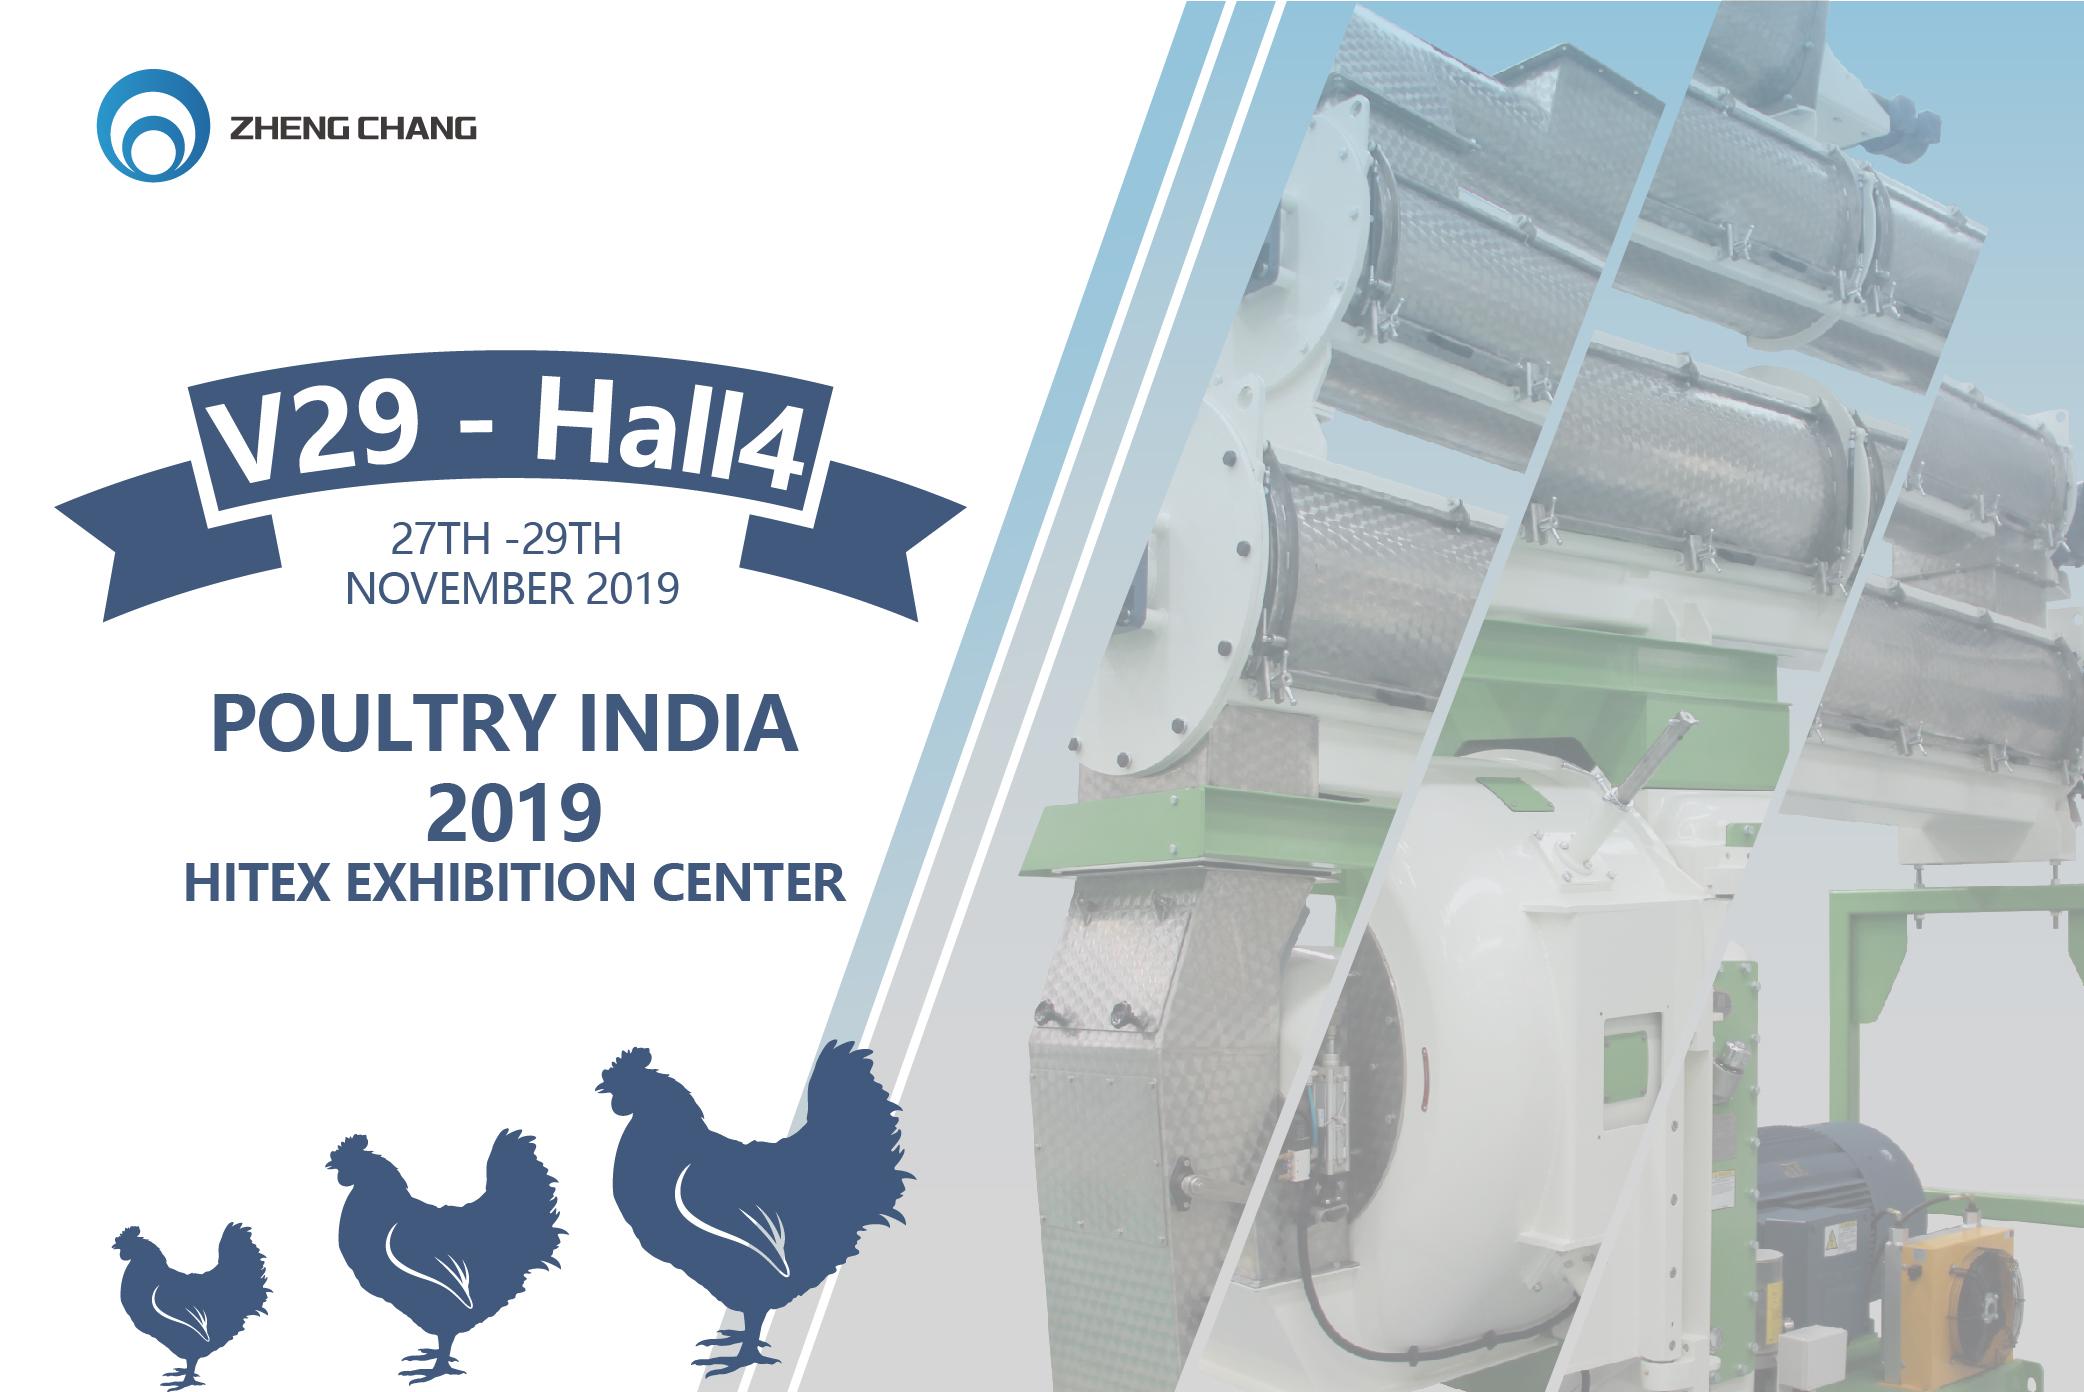 Invitation Poultry India 2019 Zhengchang News News Zhengchang